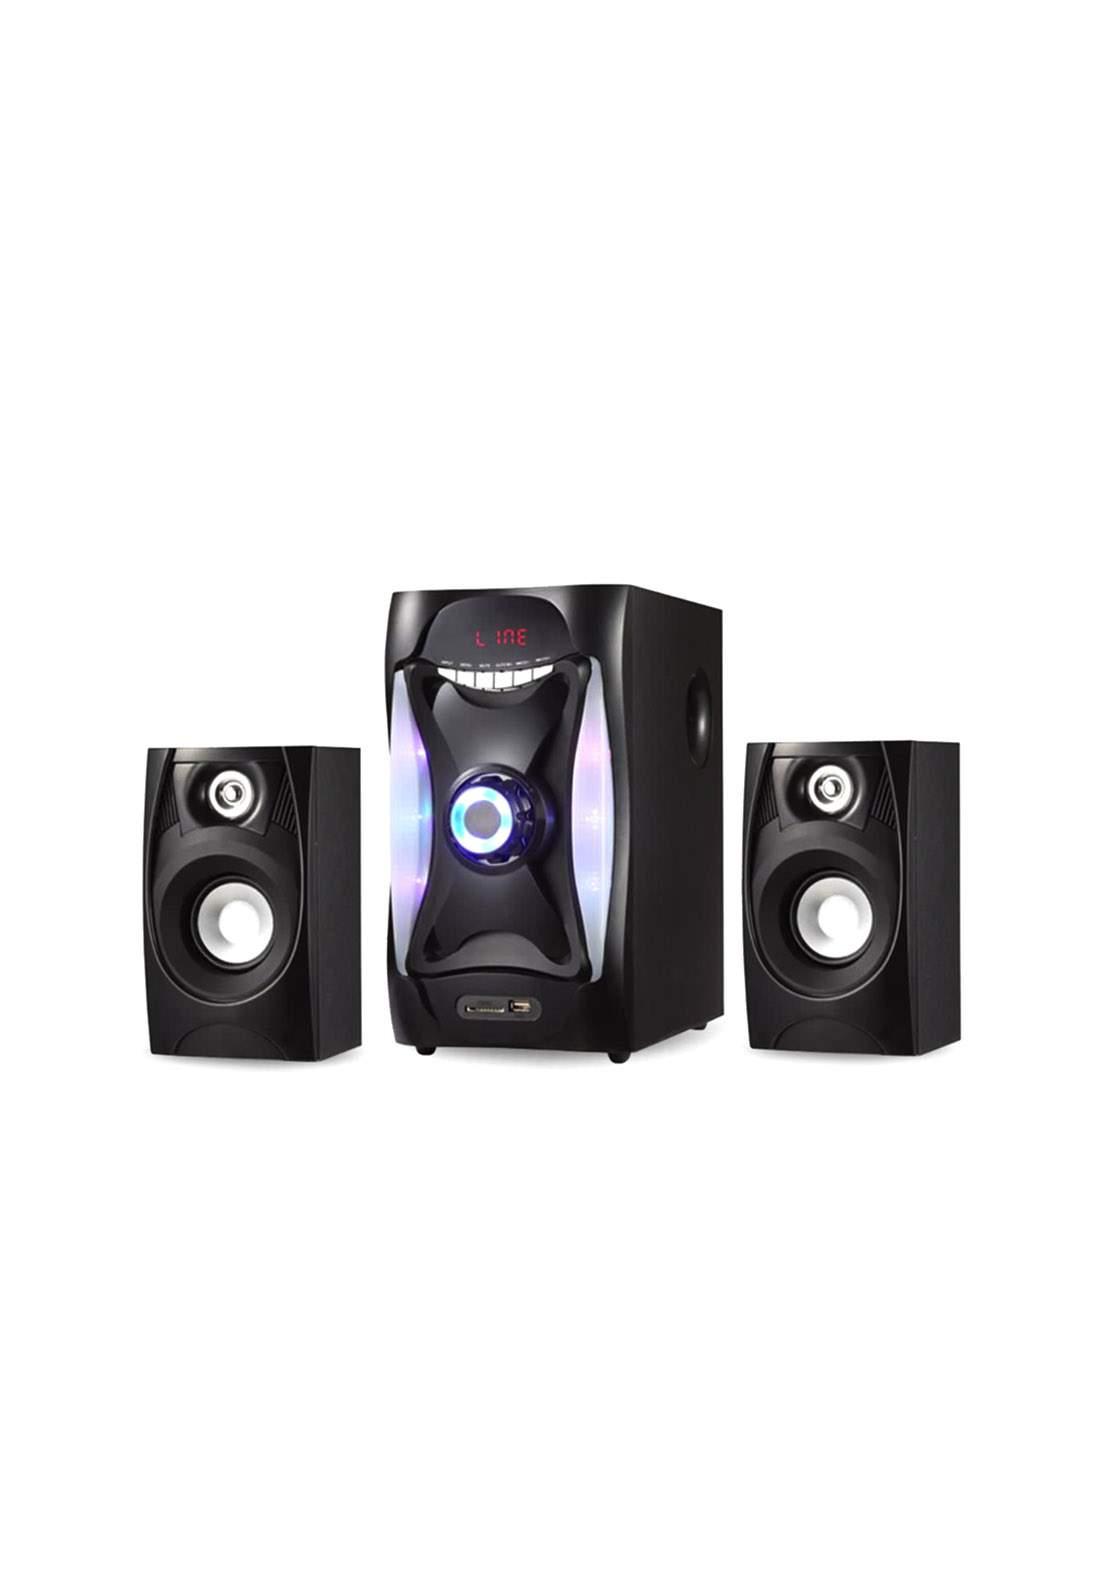 Multimedia Bluetooth Speaker E-112 - Black سبيكر